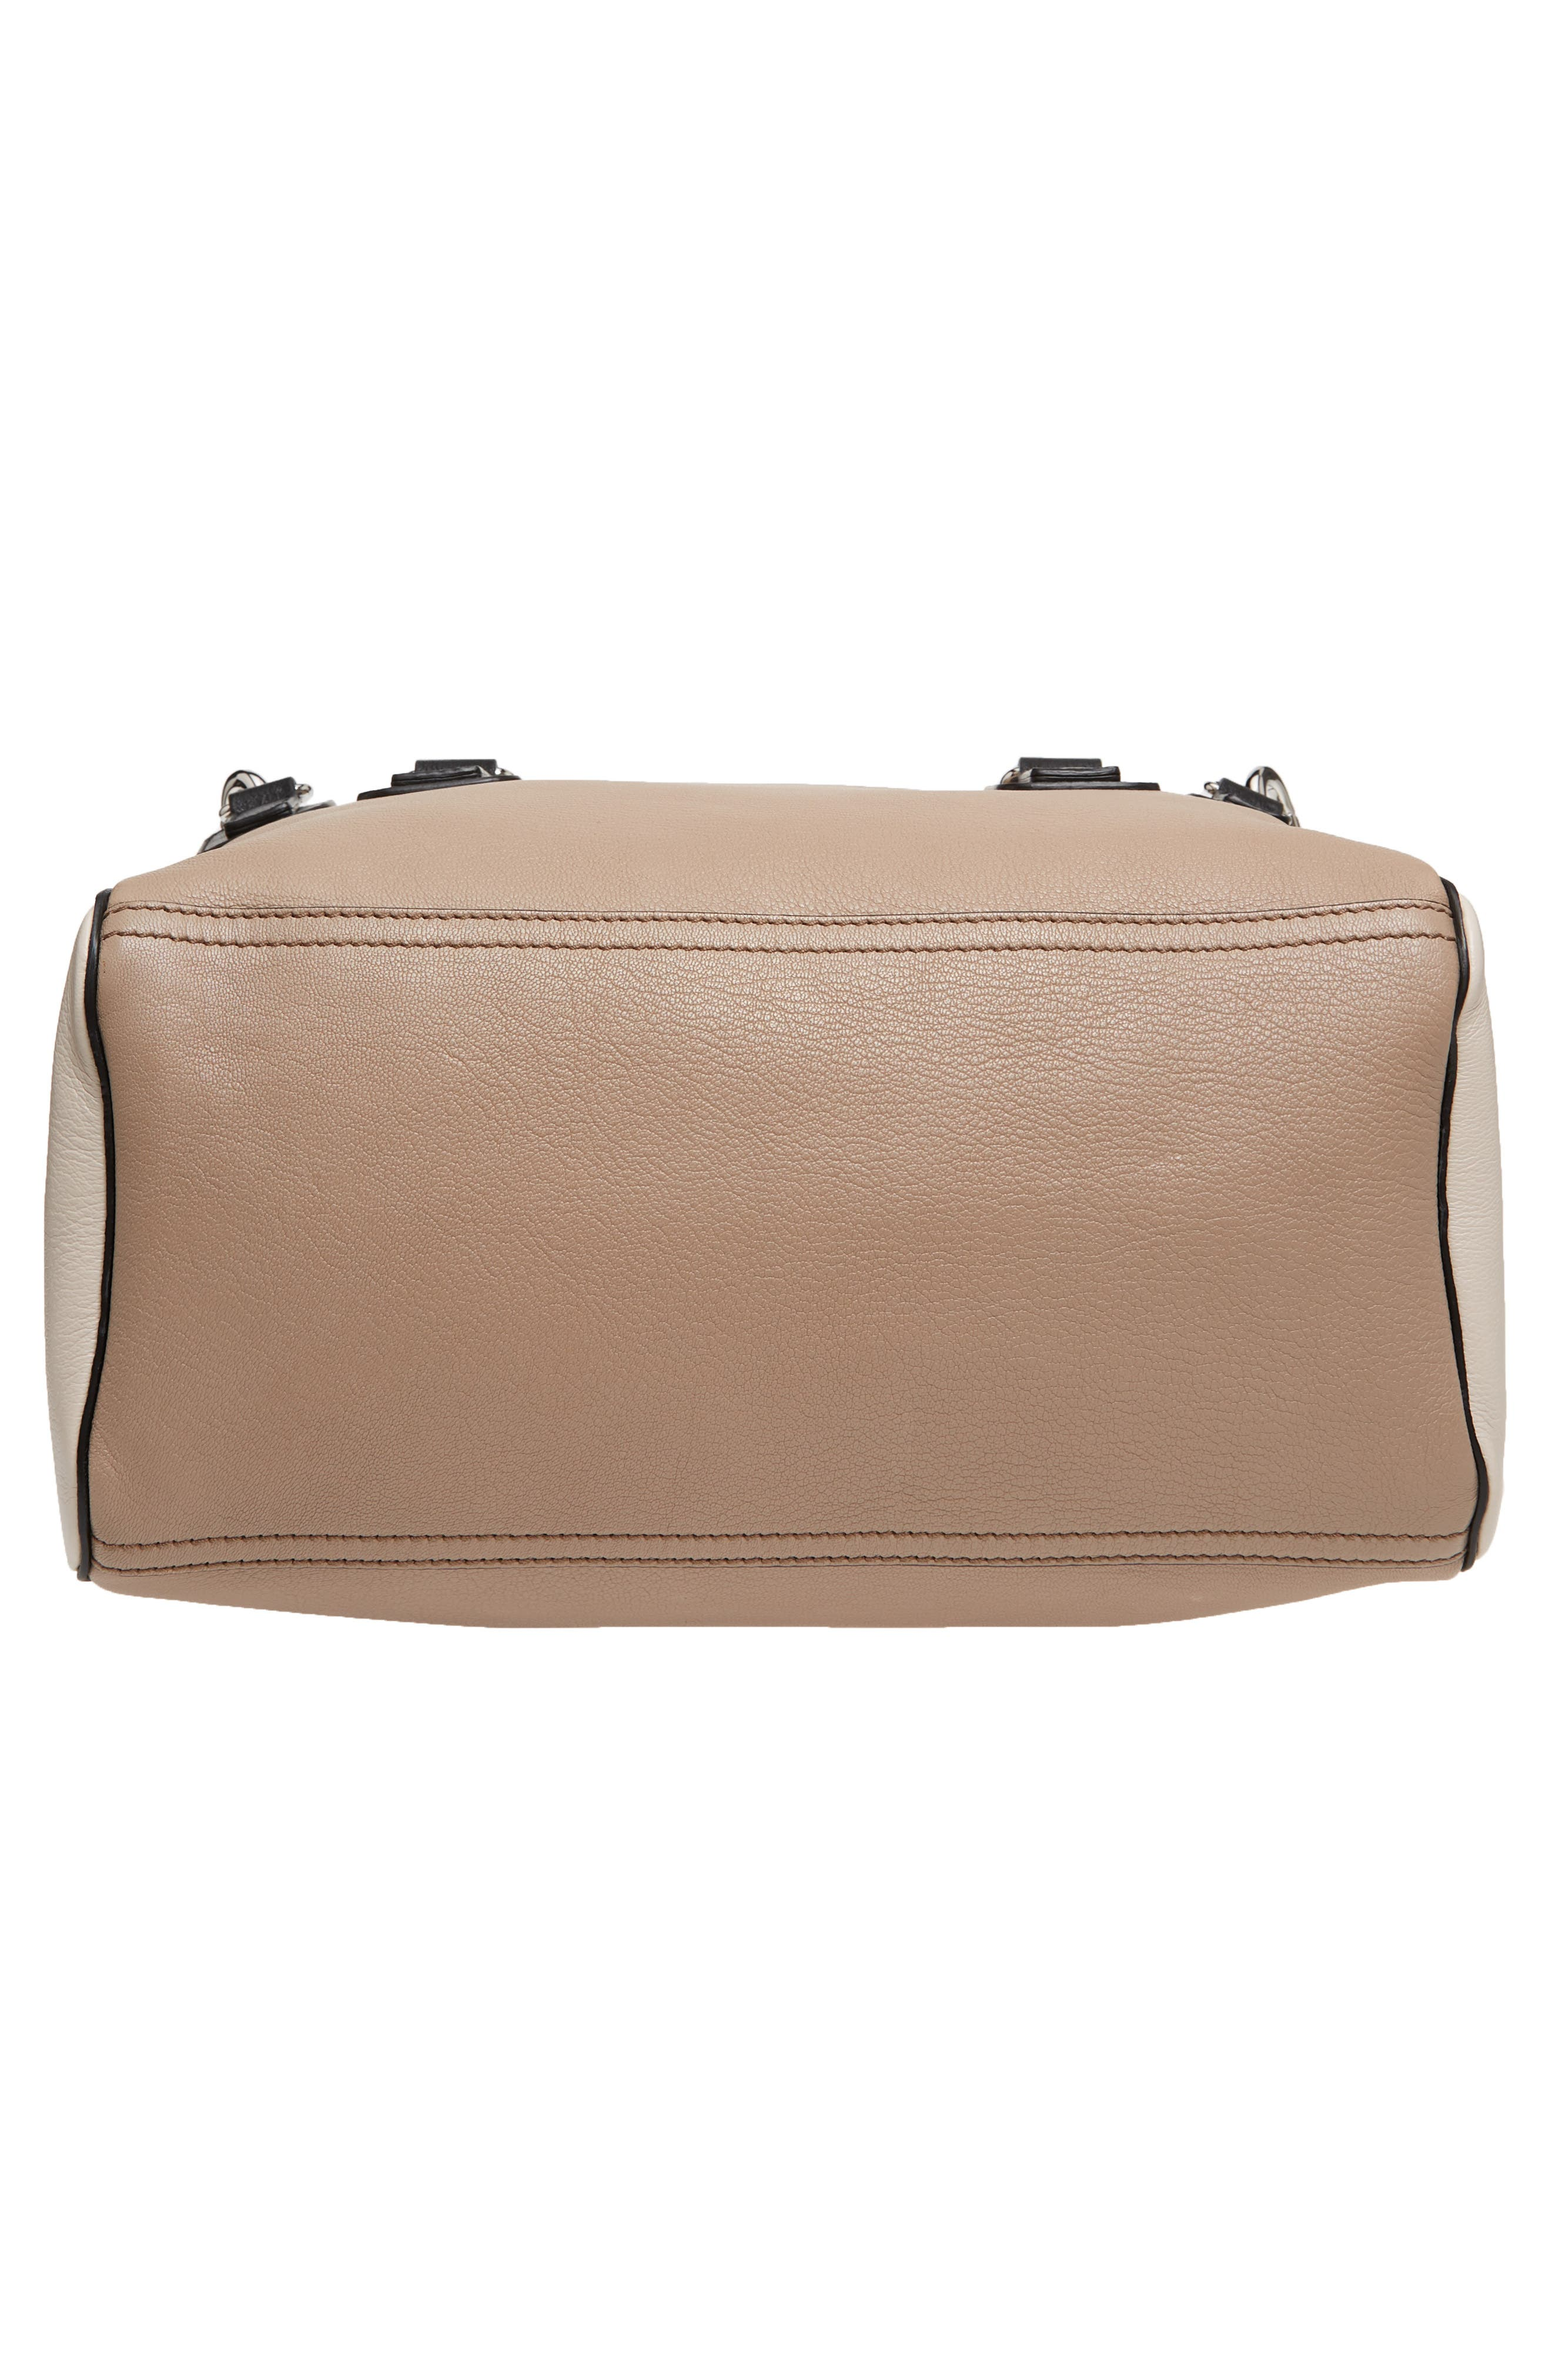 Medium Pandora Box Tricolor Leather Crossbody Bag,                             Alternate thumbnail 6, color,                             250